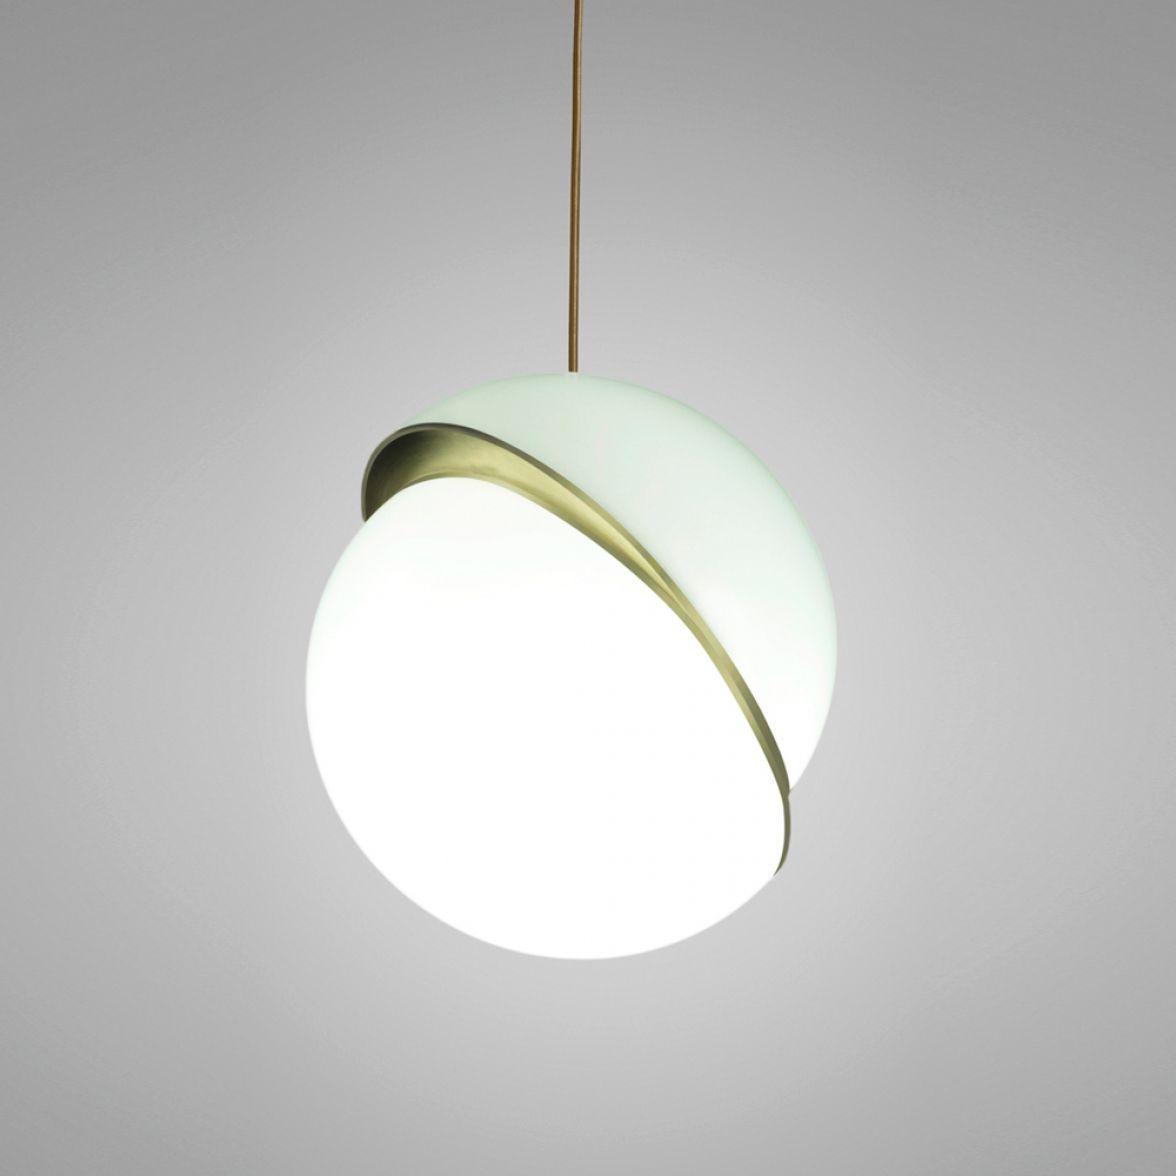 Crescent light pendant фото цена